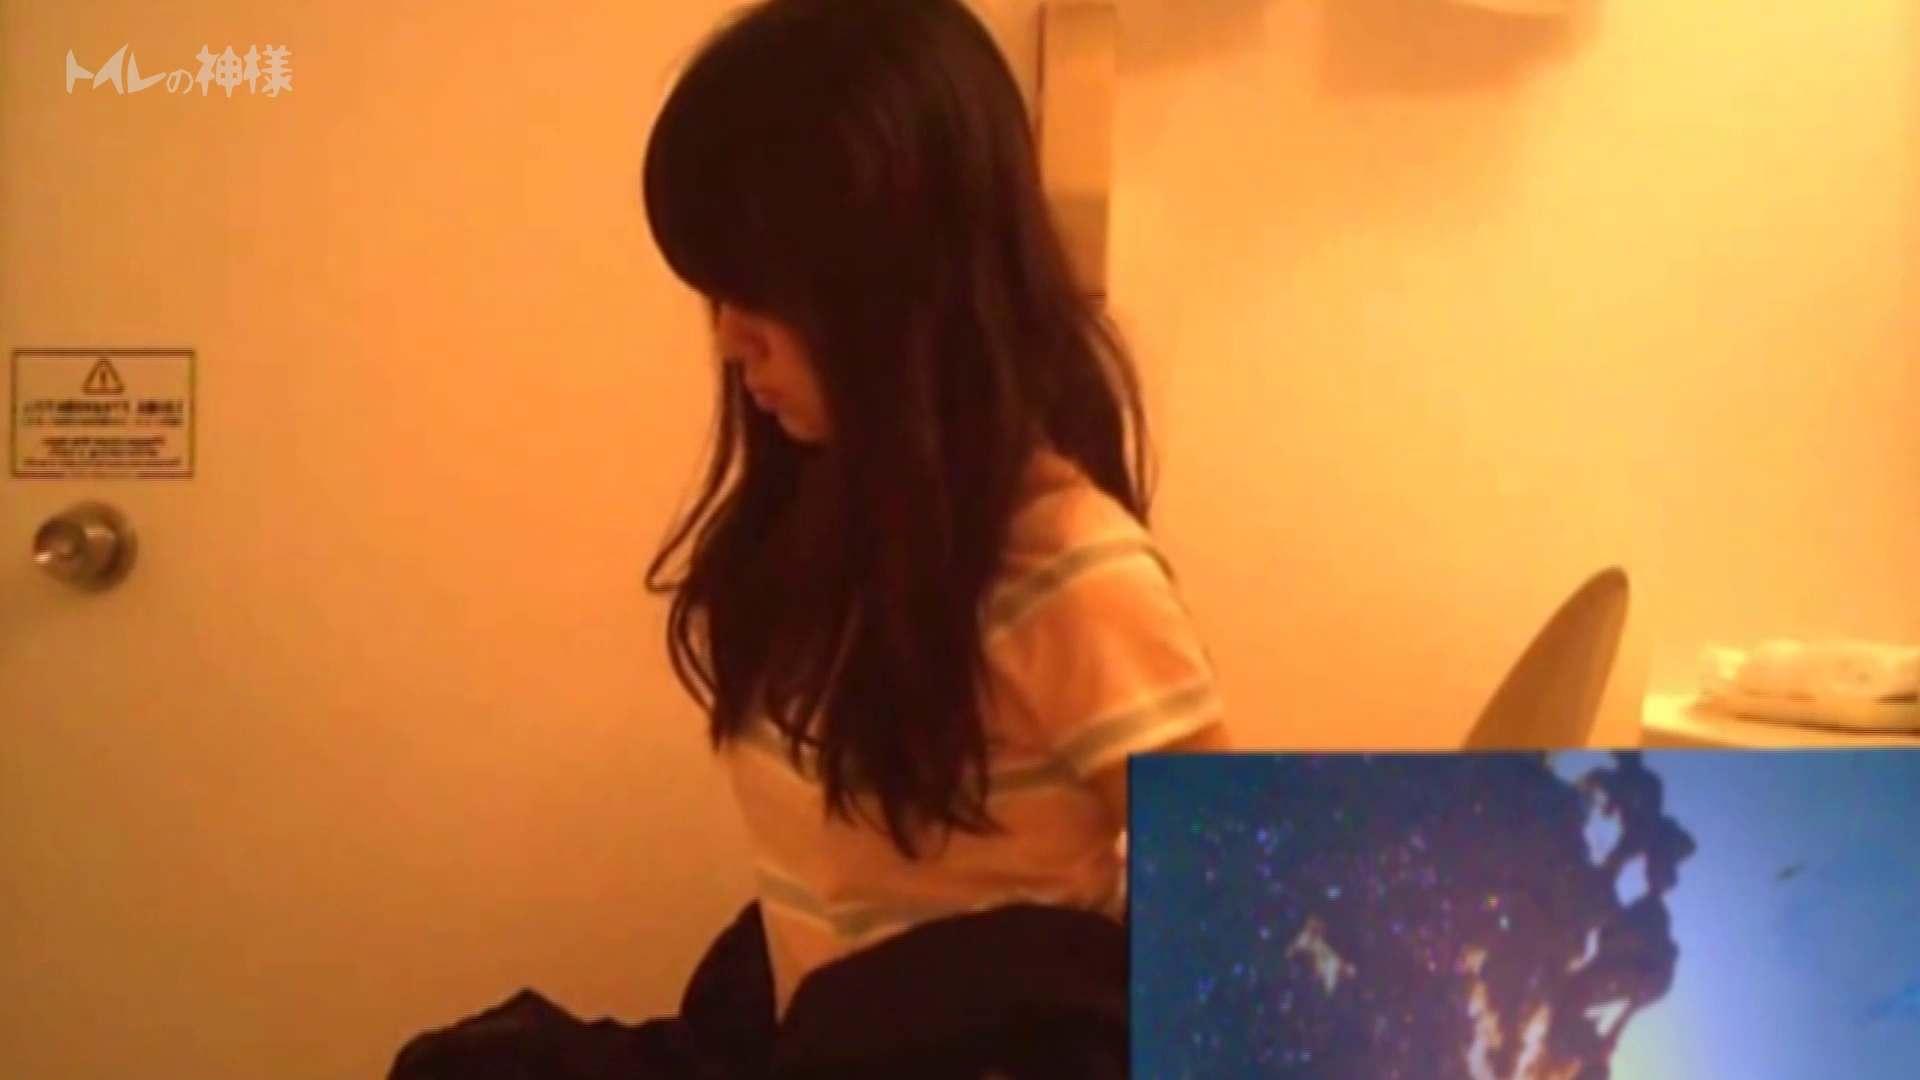 Vol.04 女子大生のトイレ恥態 OLハメ撮り  104Pix 94